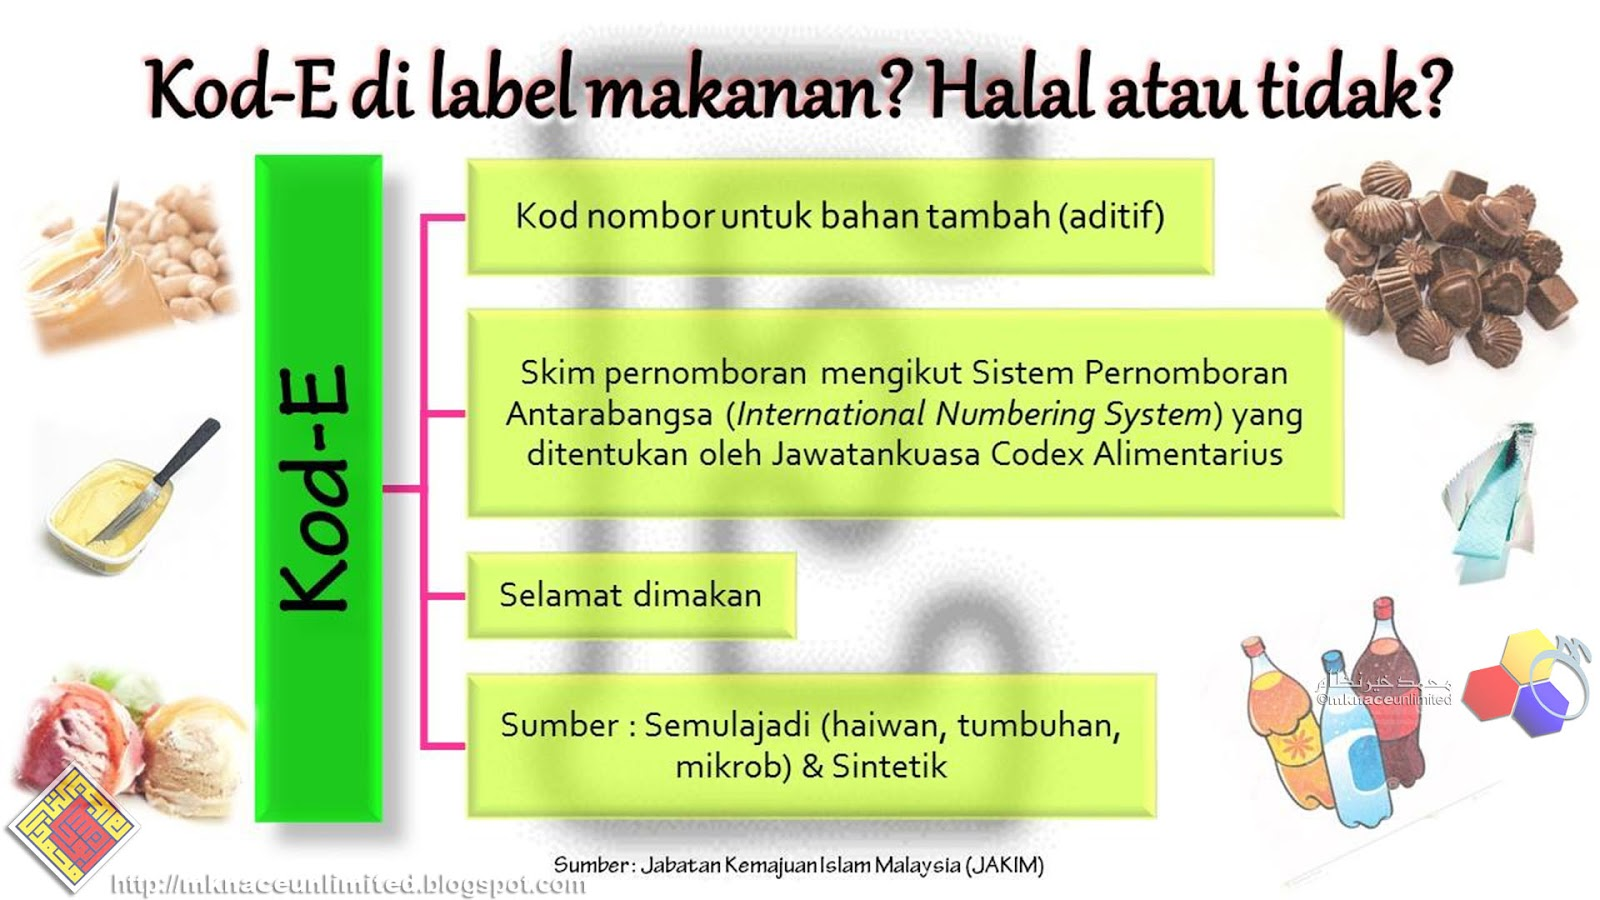 Kod E di label makanan, halal